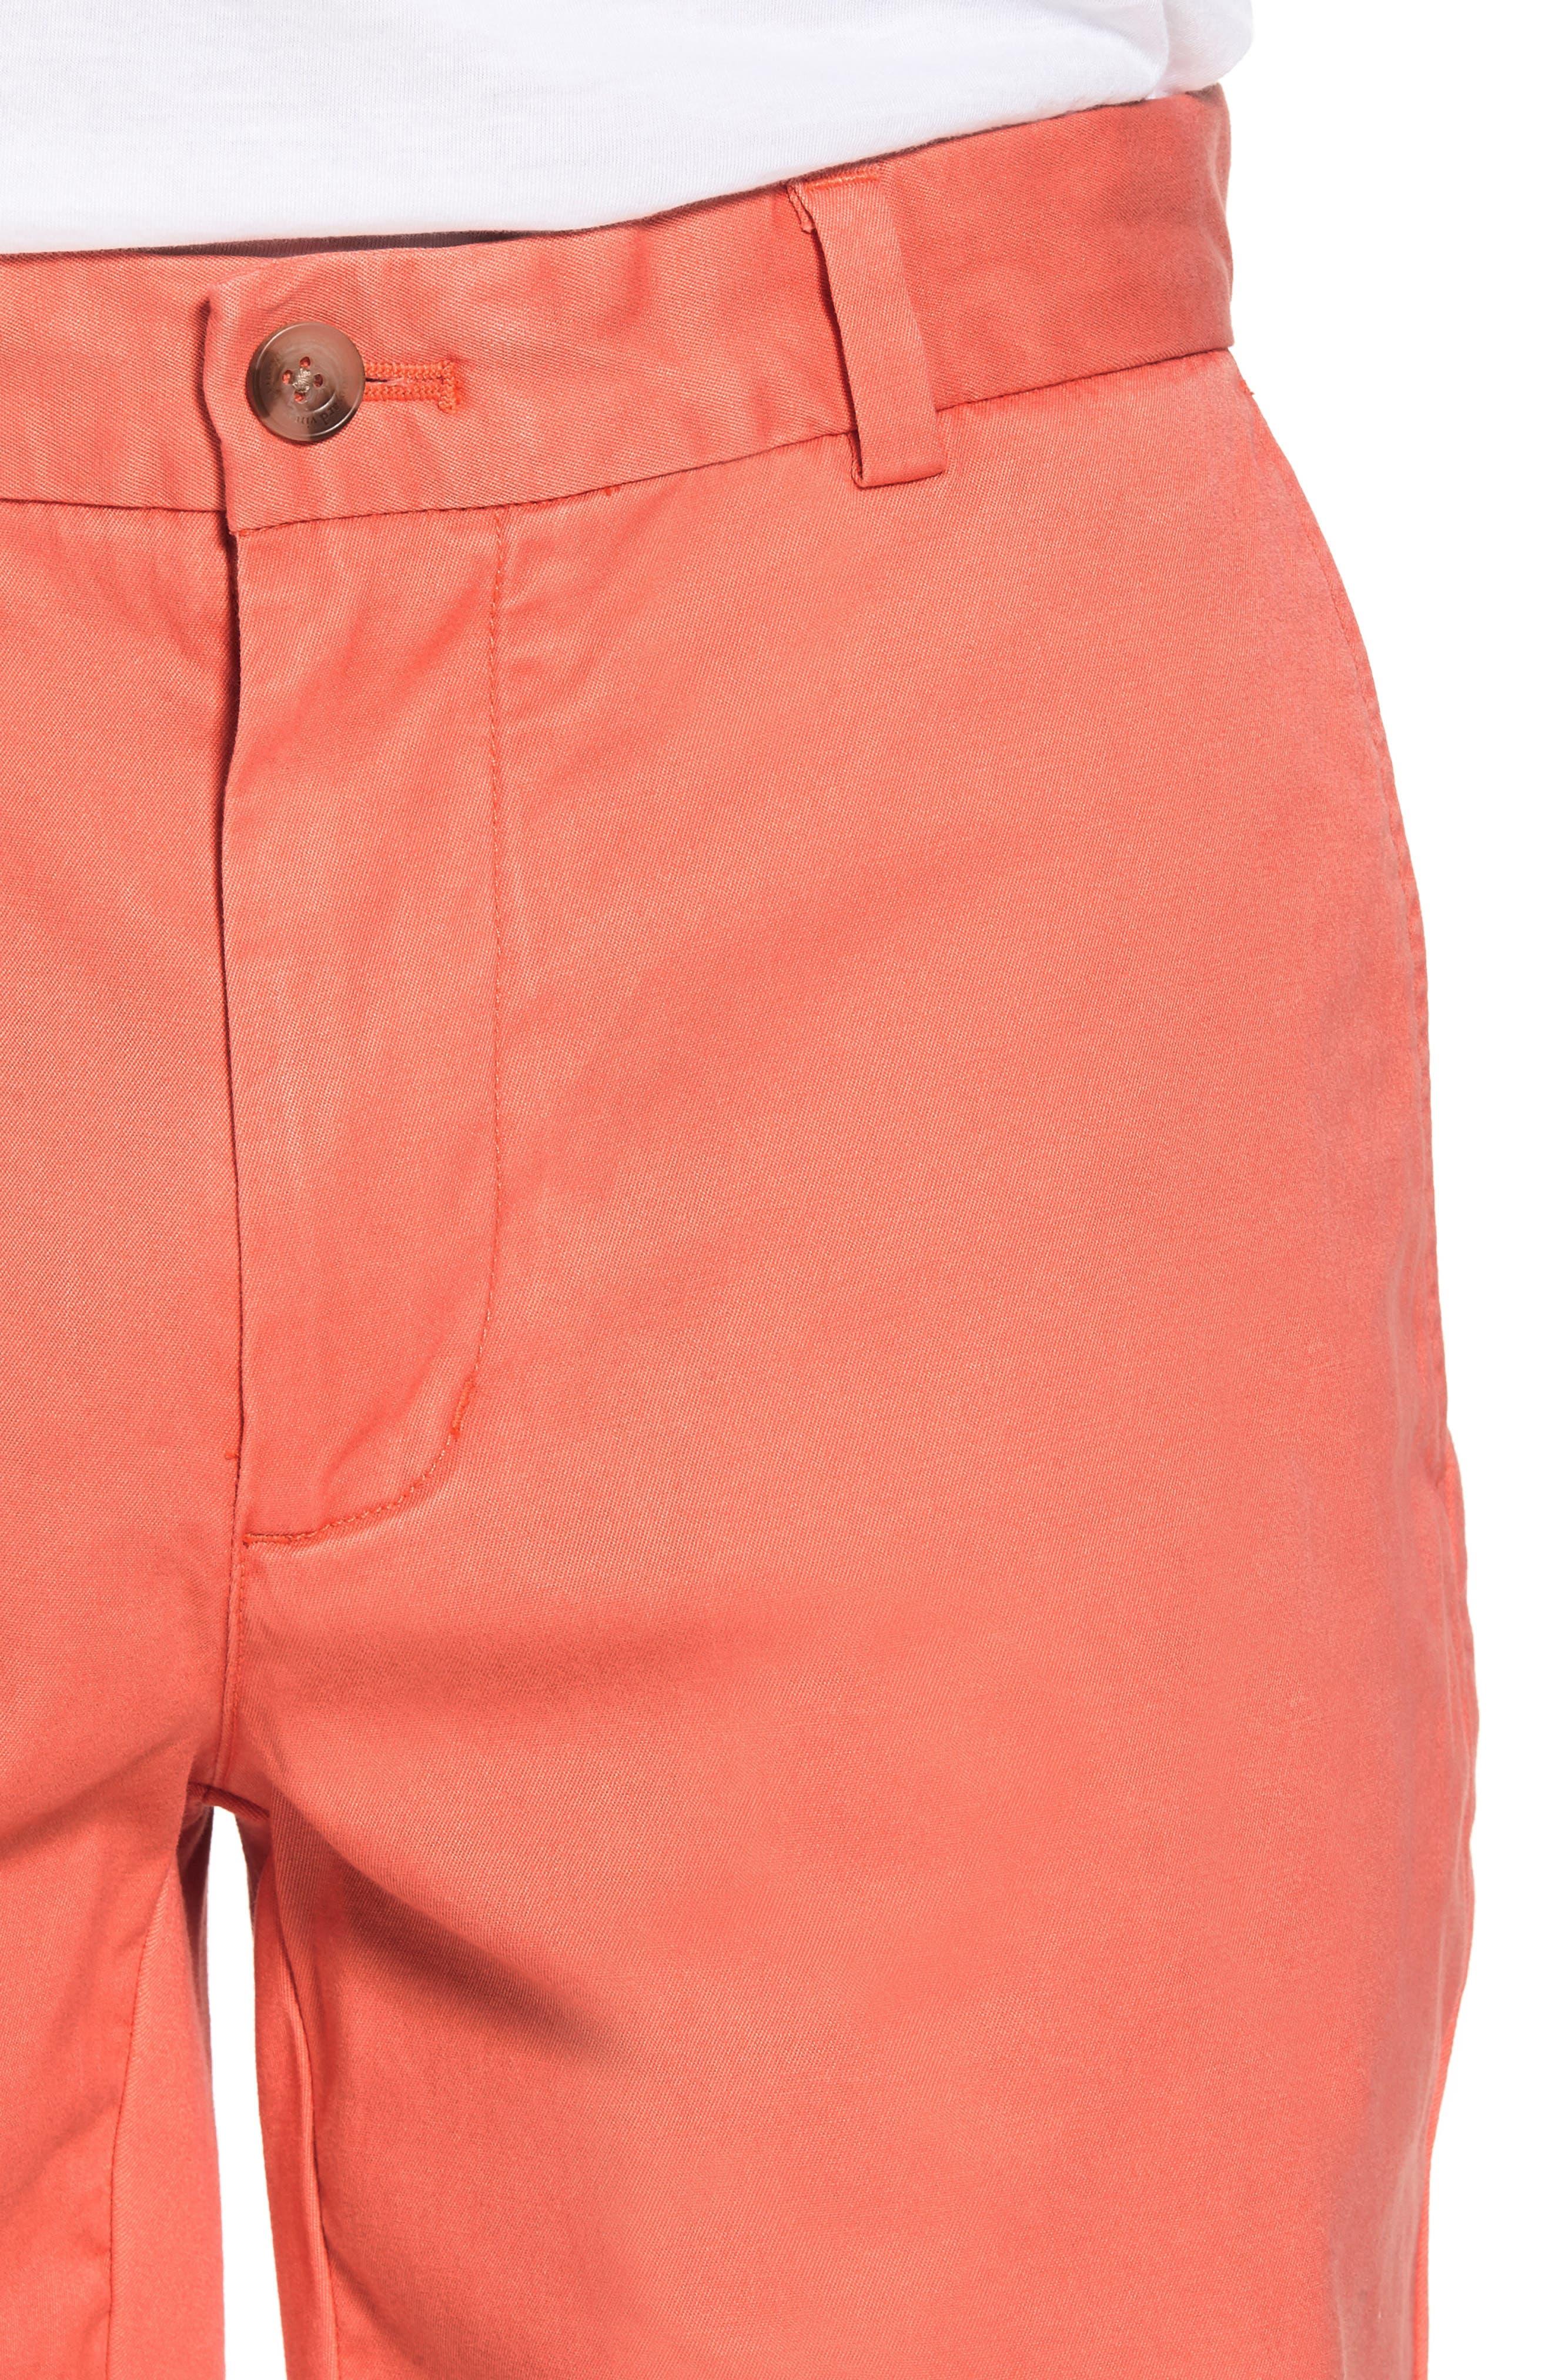 9 Inch Stretch Breaker Shorts,                             Alternate thumbnail 78, color,